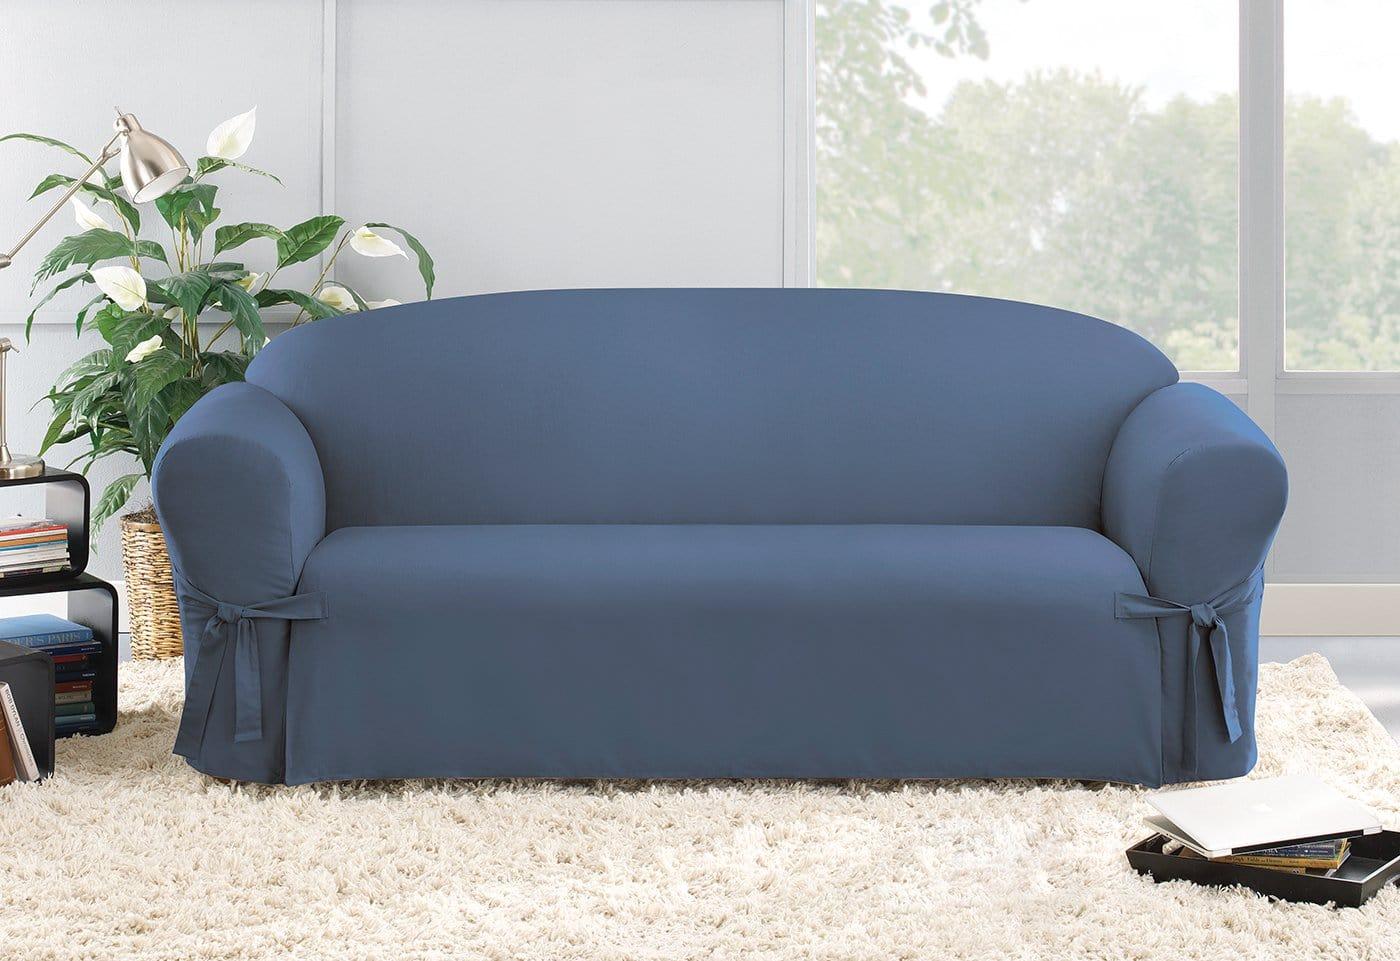 durham one piece sofa slipcover dallas bed dreams cotton duck  surefit